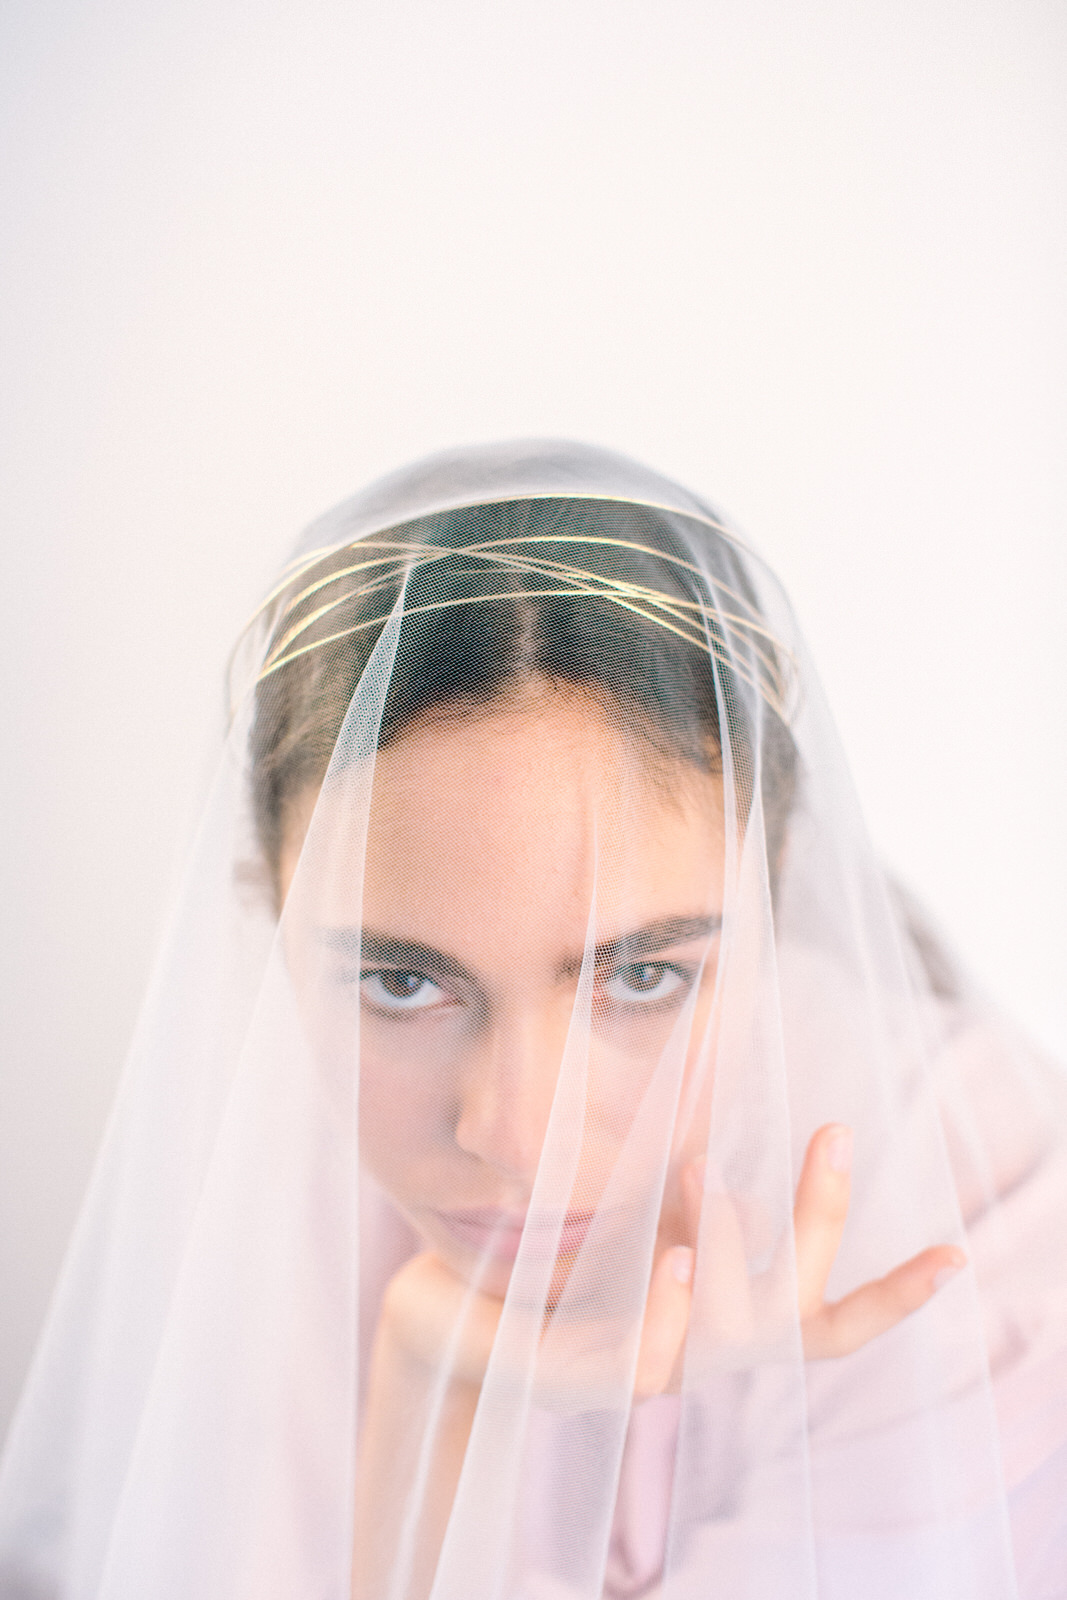 Luxury Jewel Photography for Nea Milano